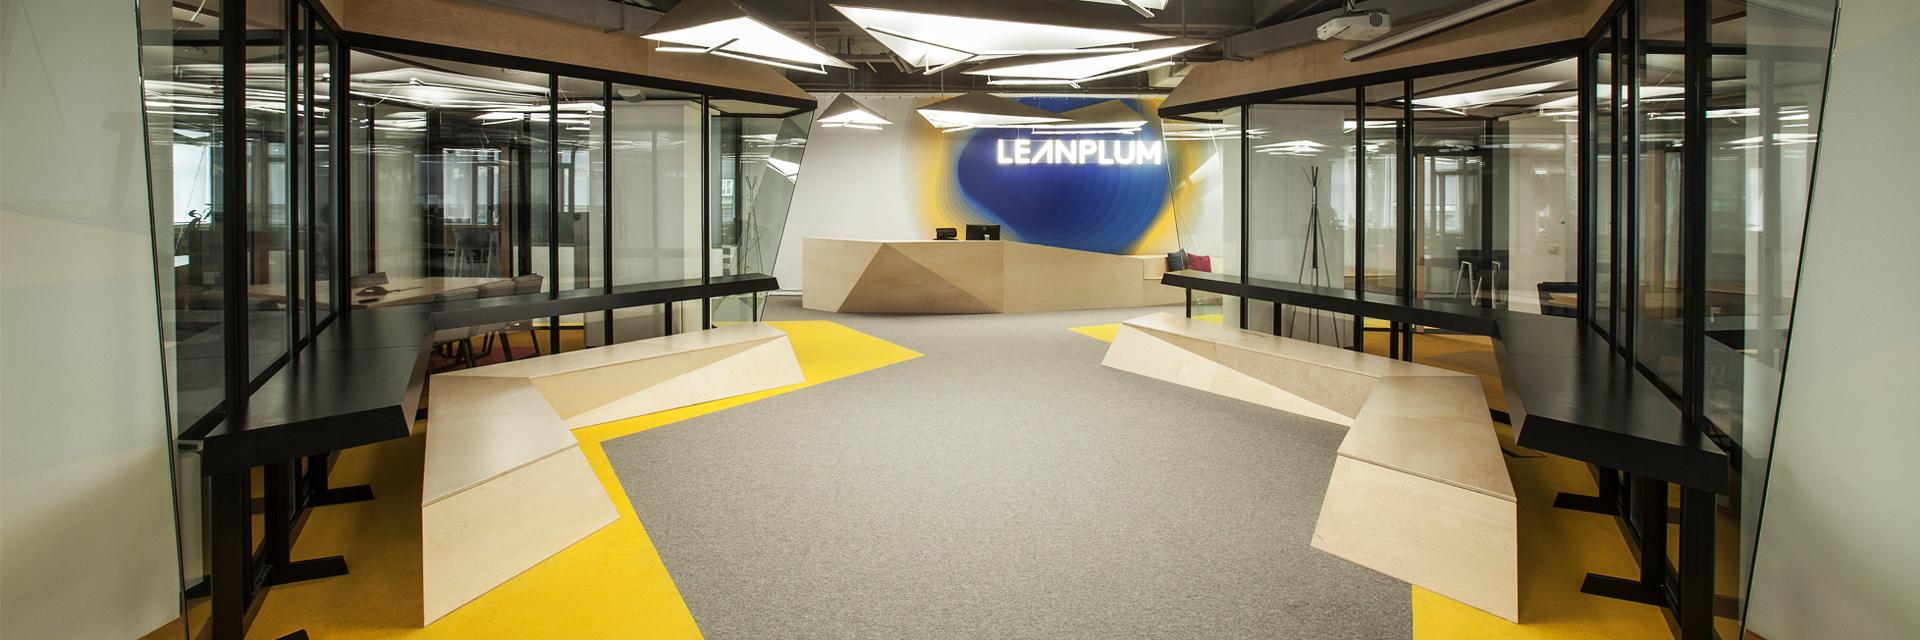 leanplum, front desk design, welcome area, office design